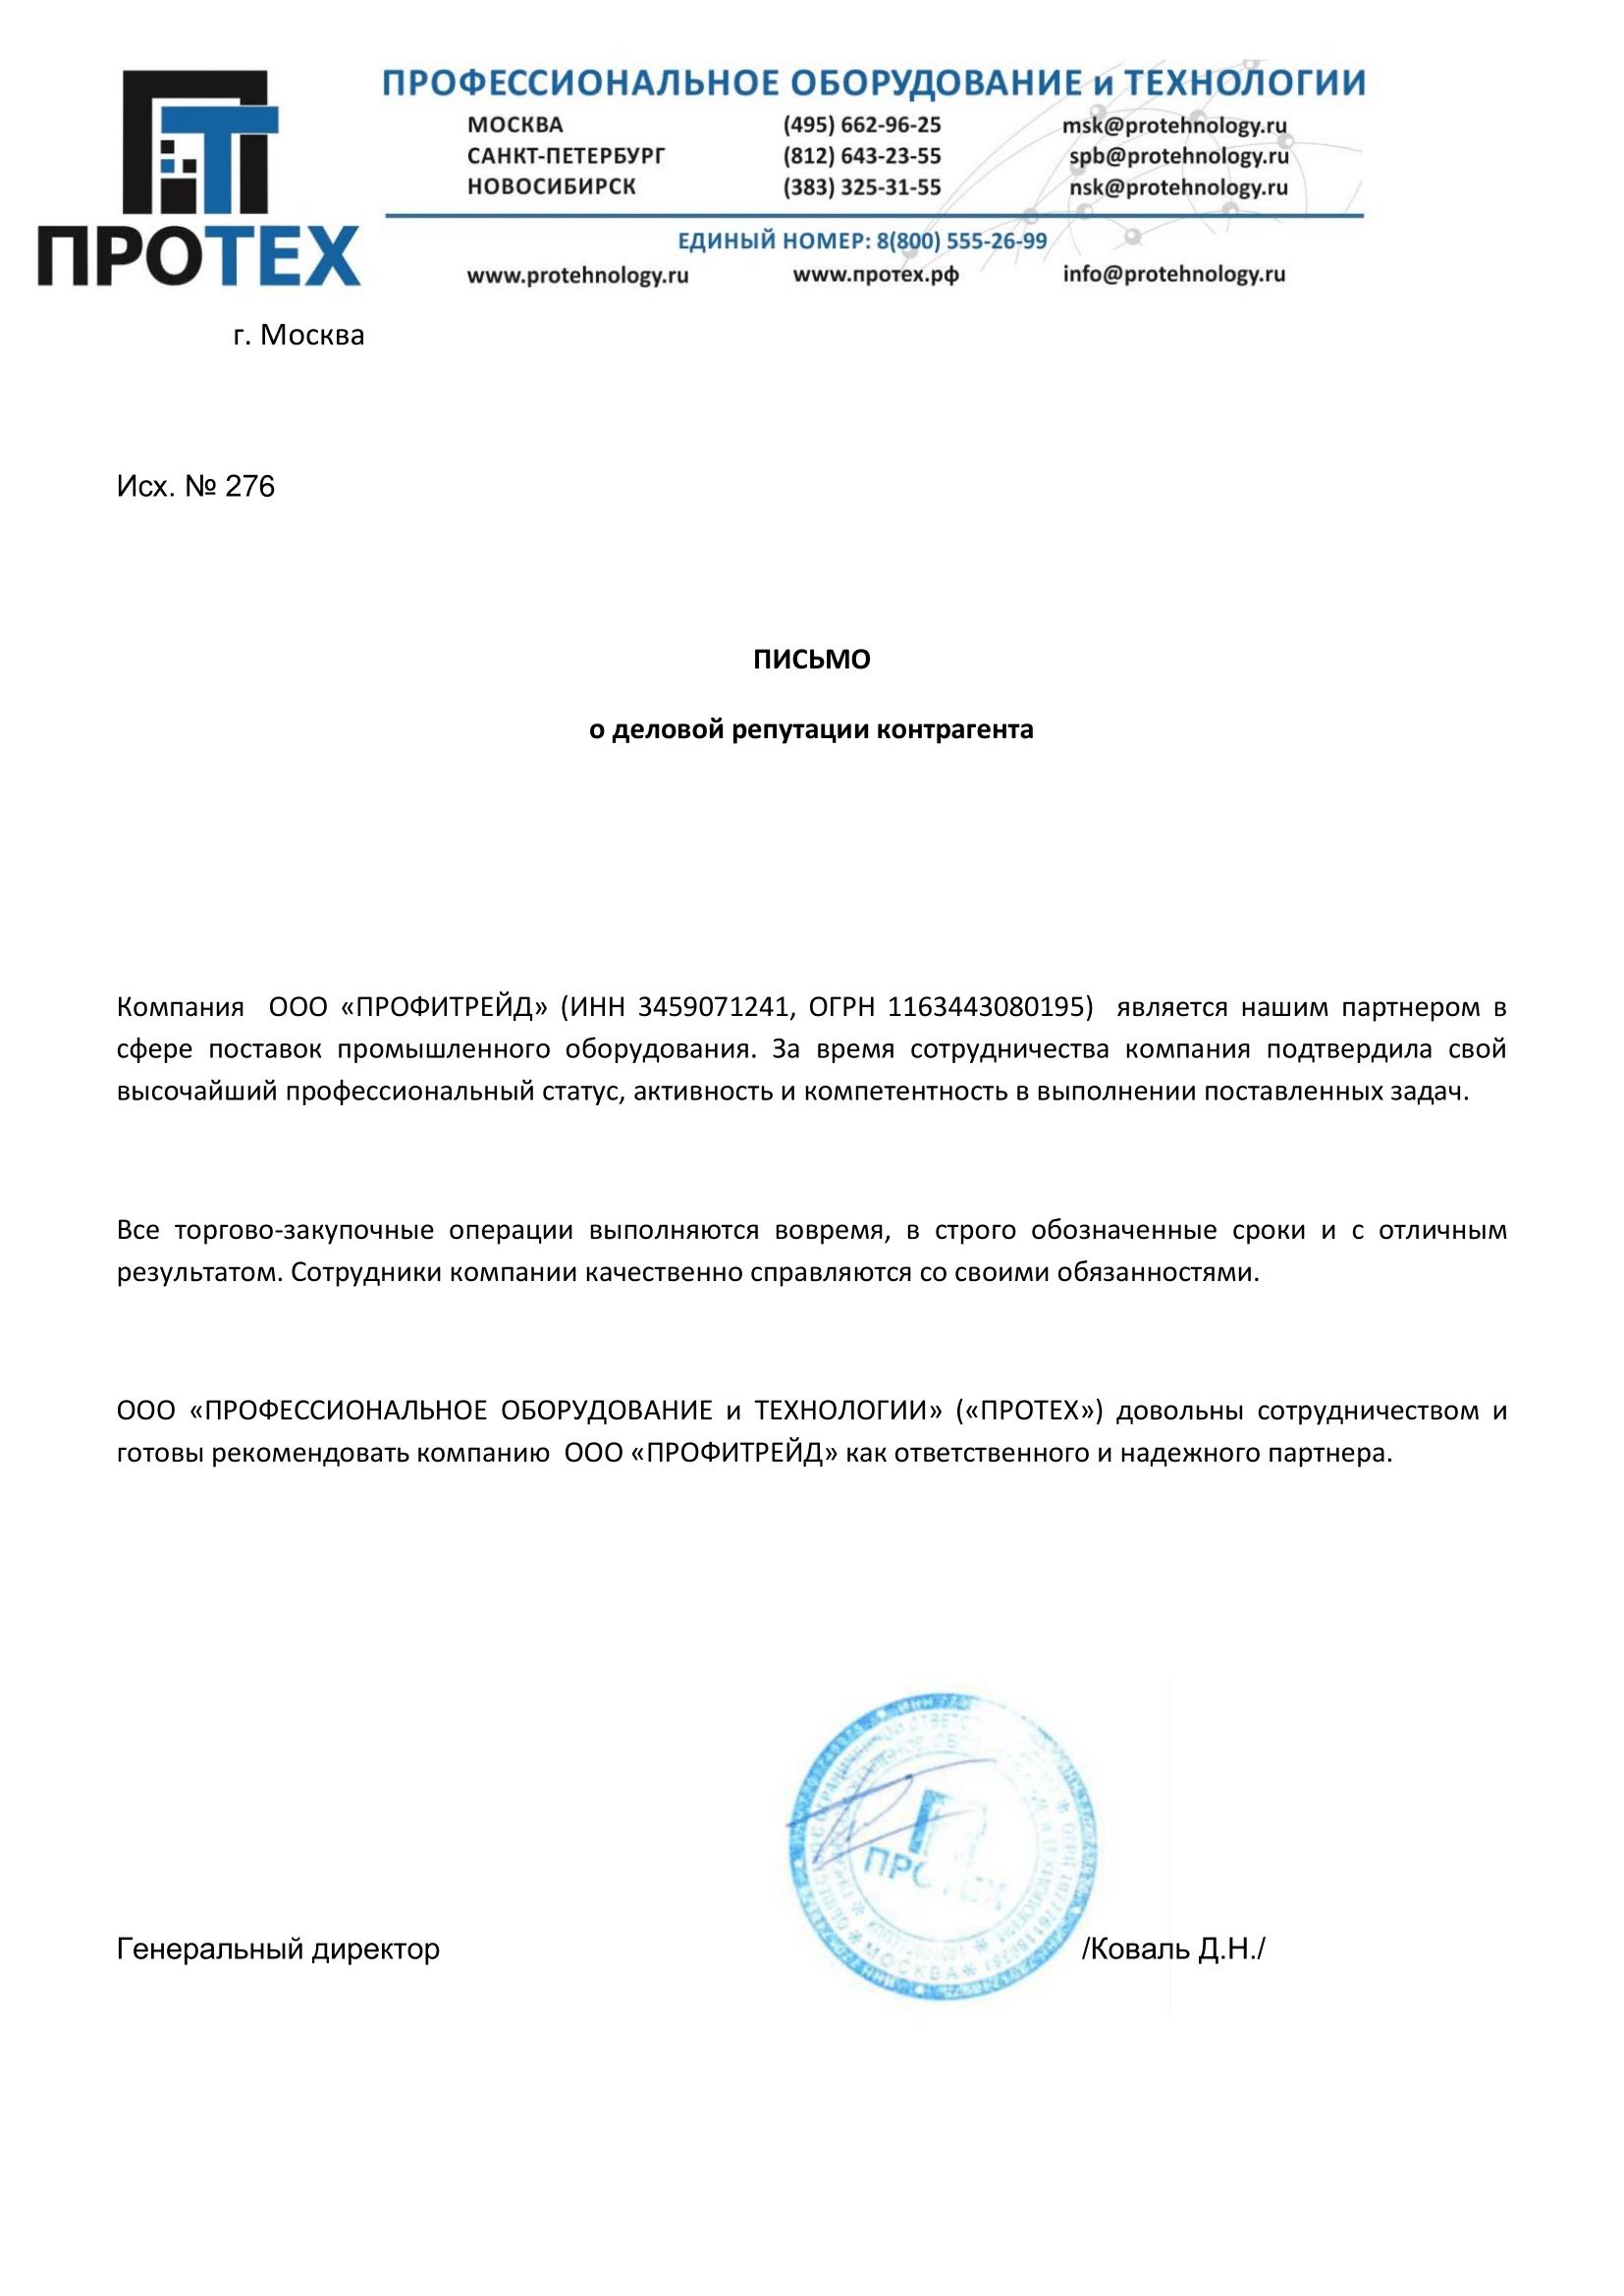 Письмо о репутации-1